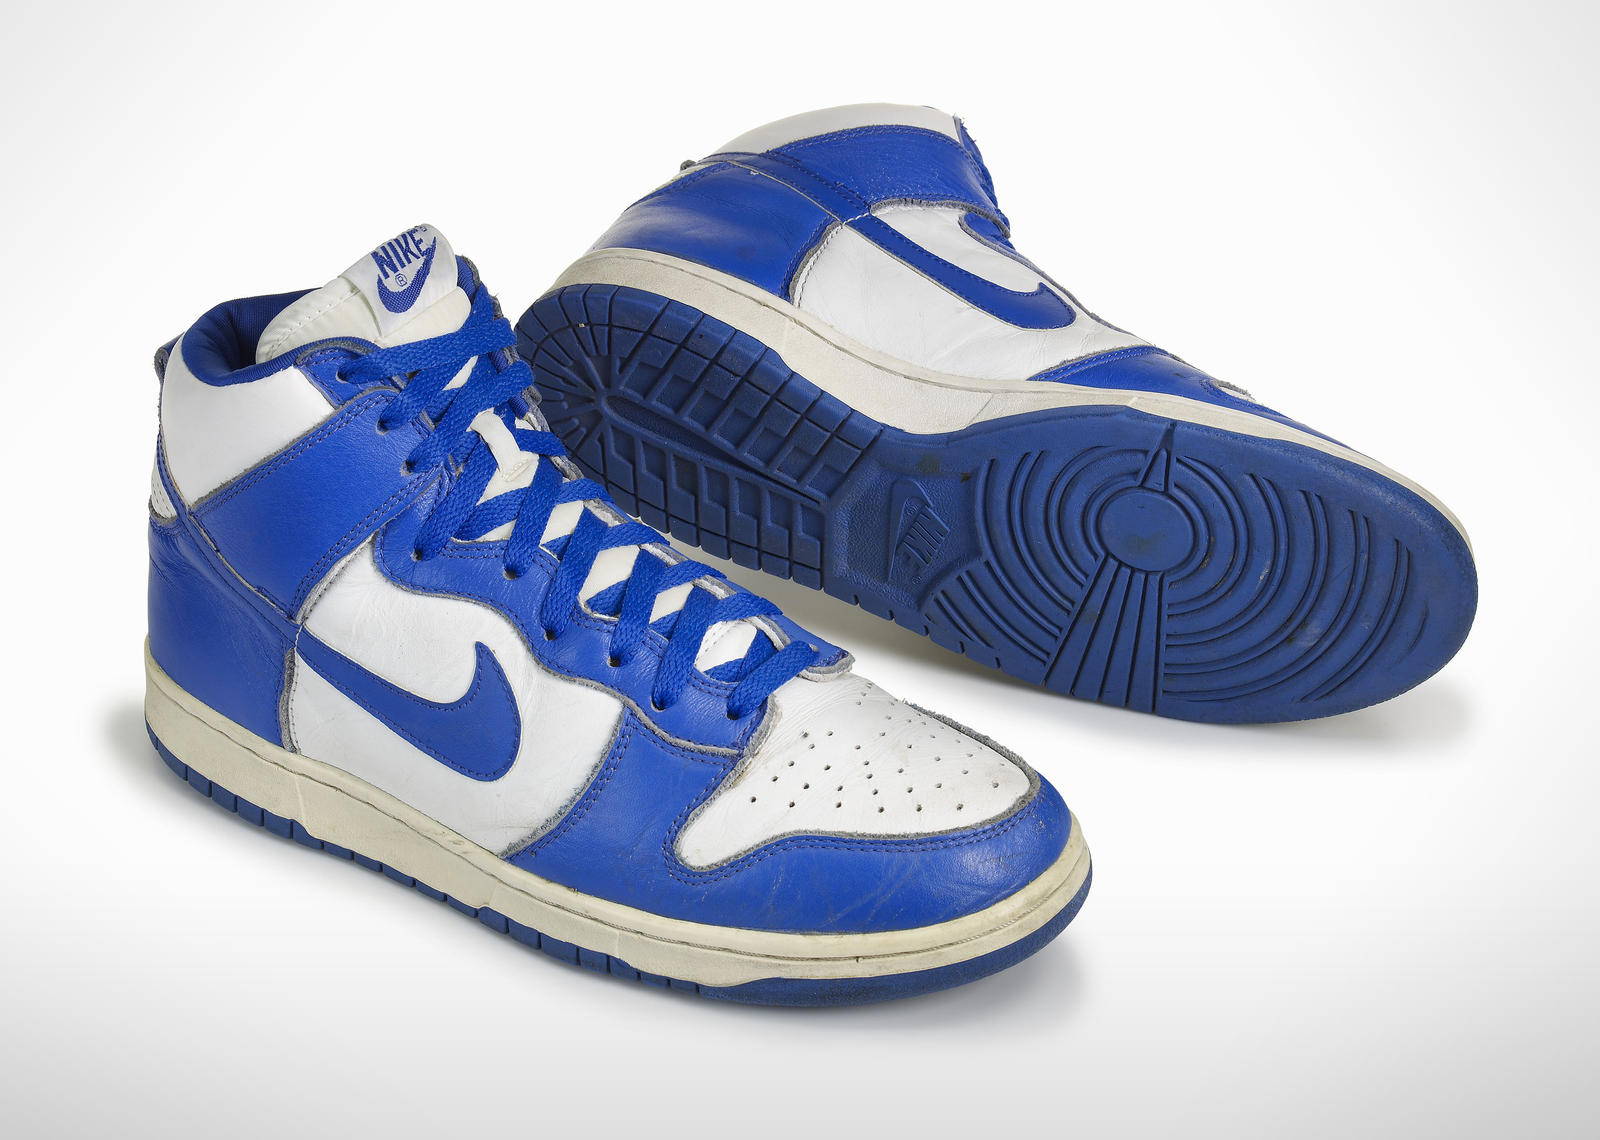 Nike Dunk Golf Shoes White